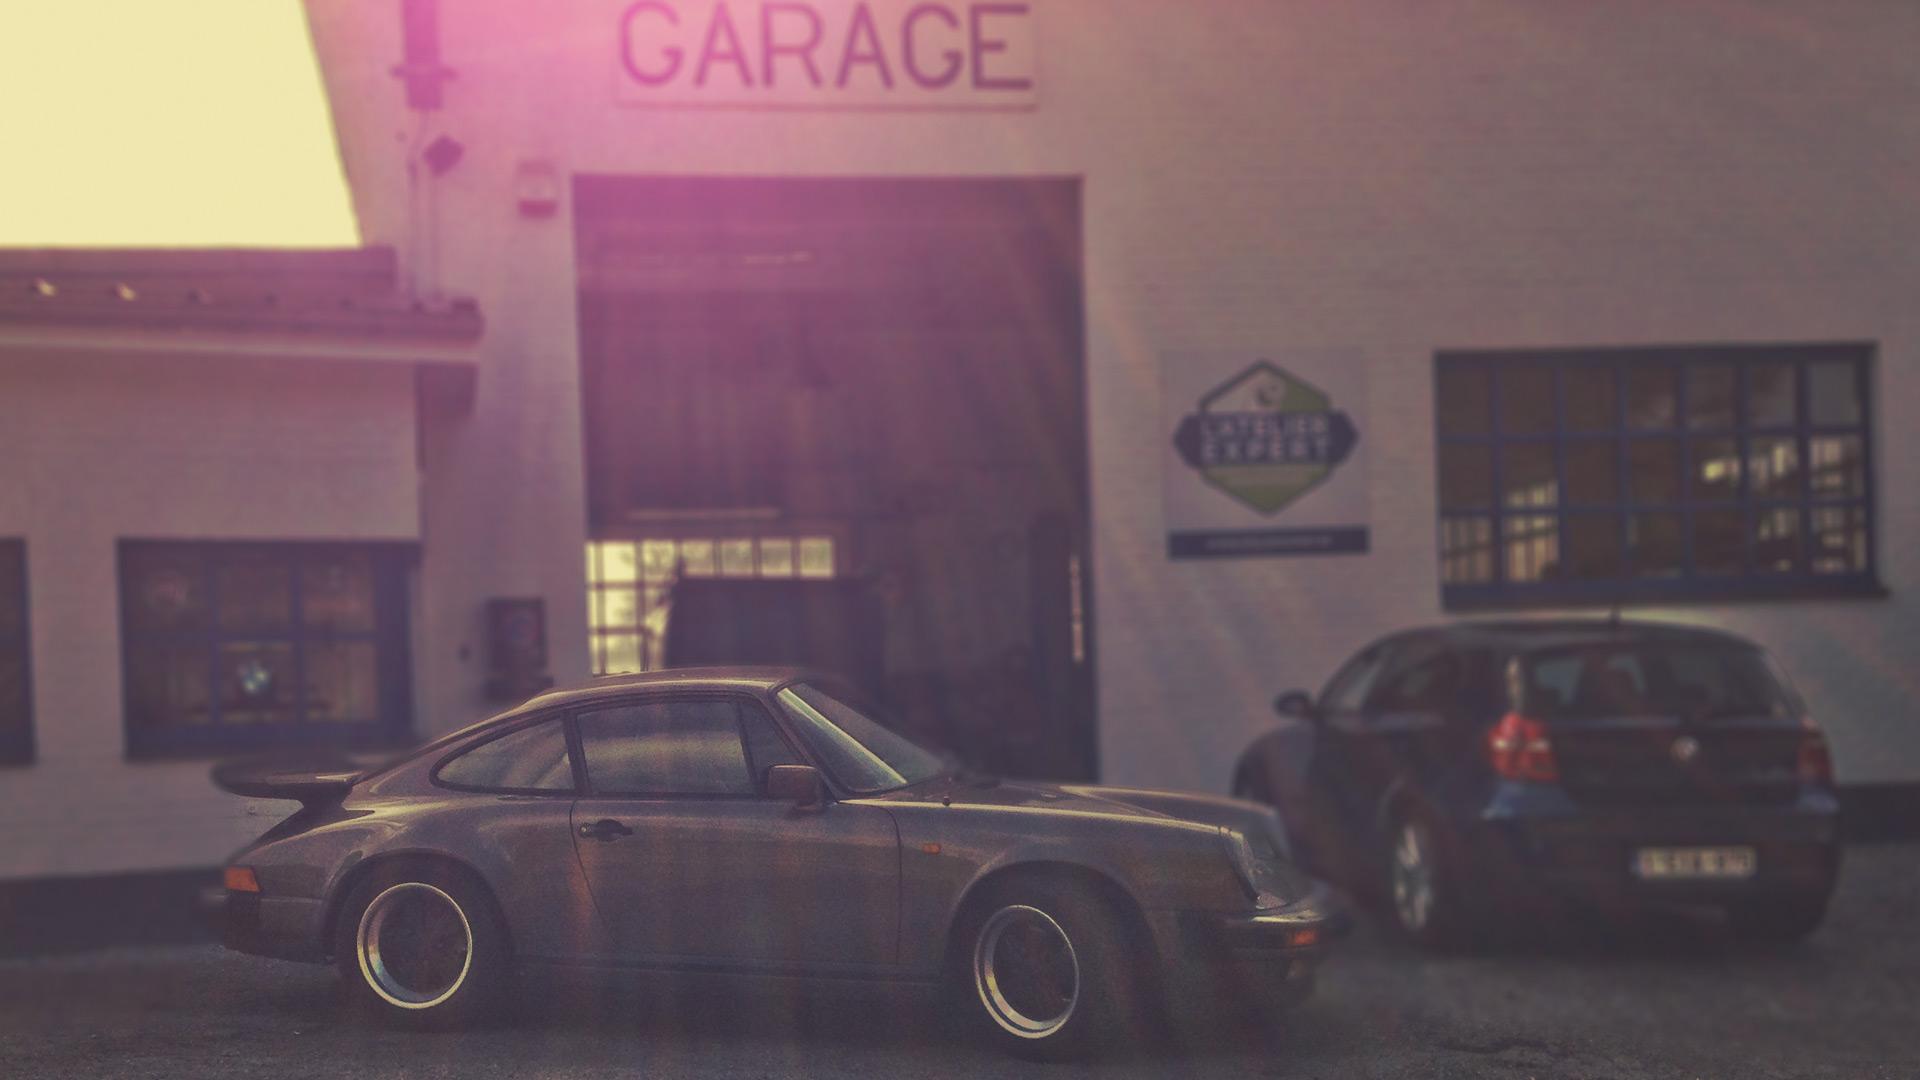 GarageGsMotors